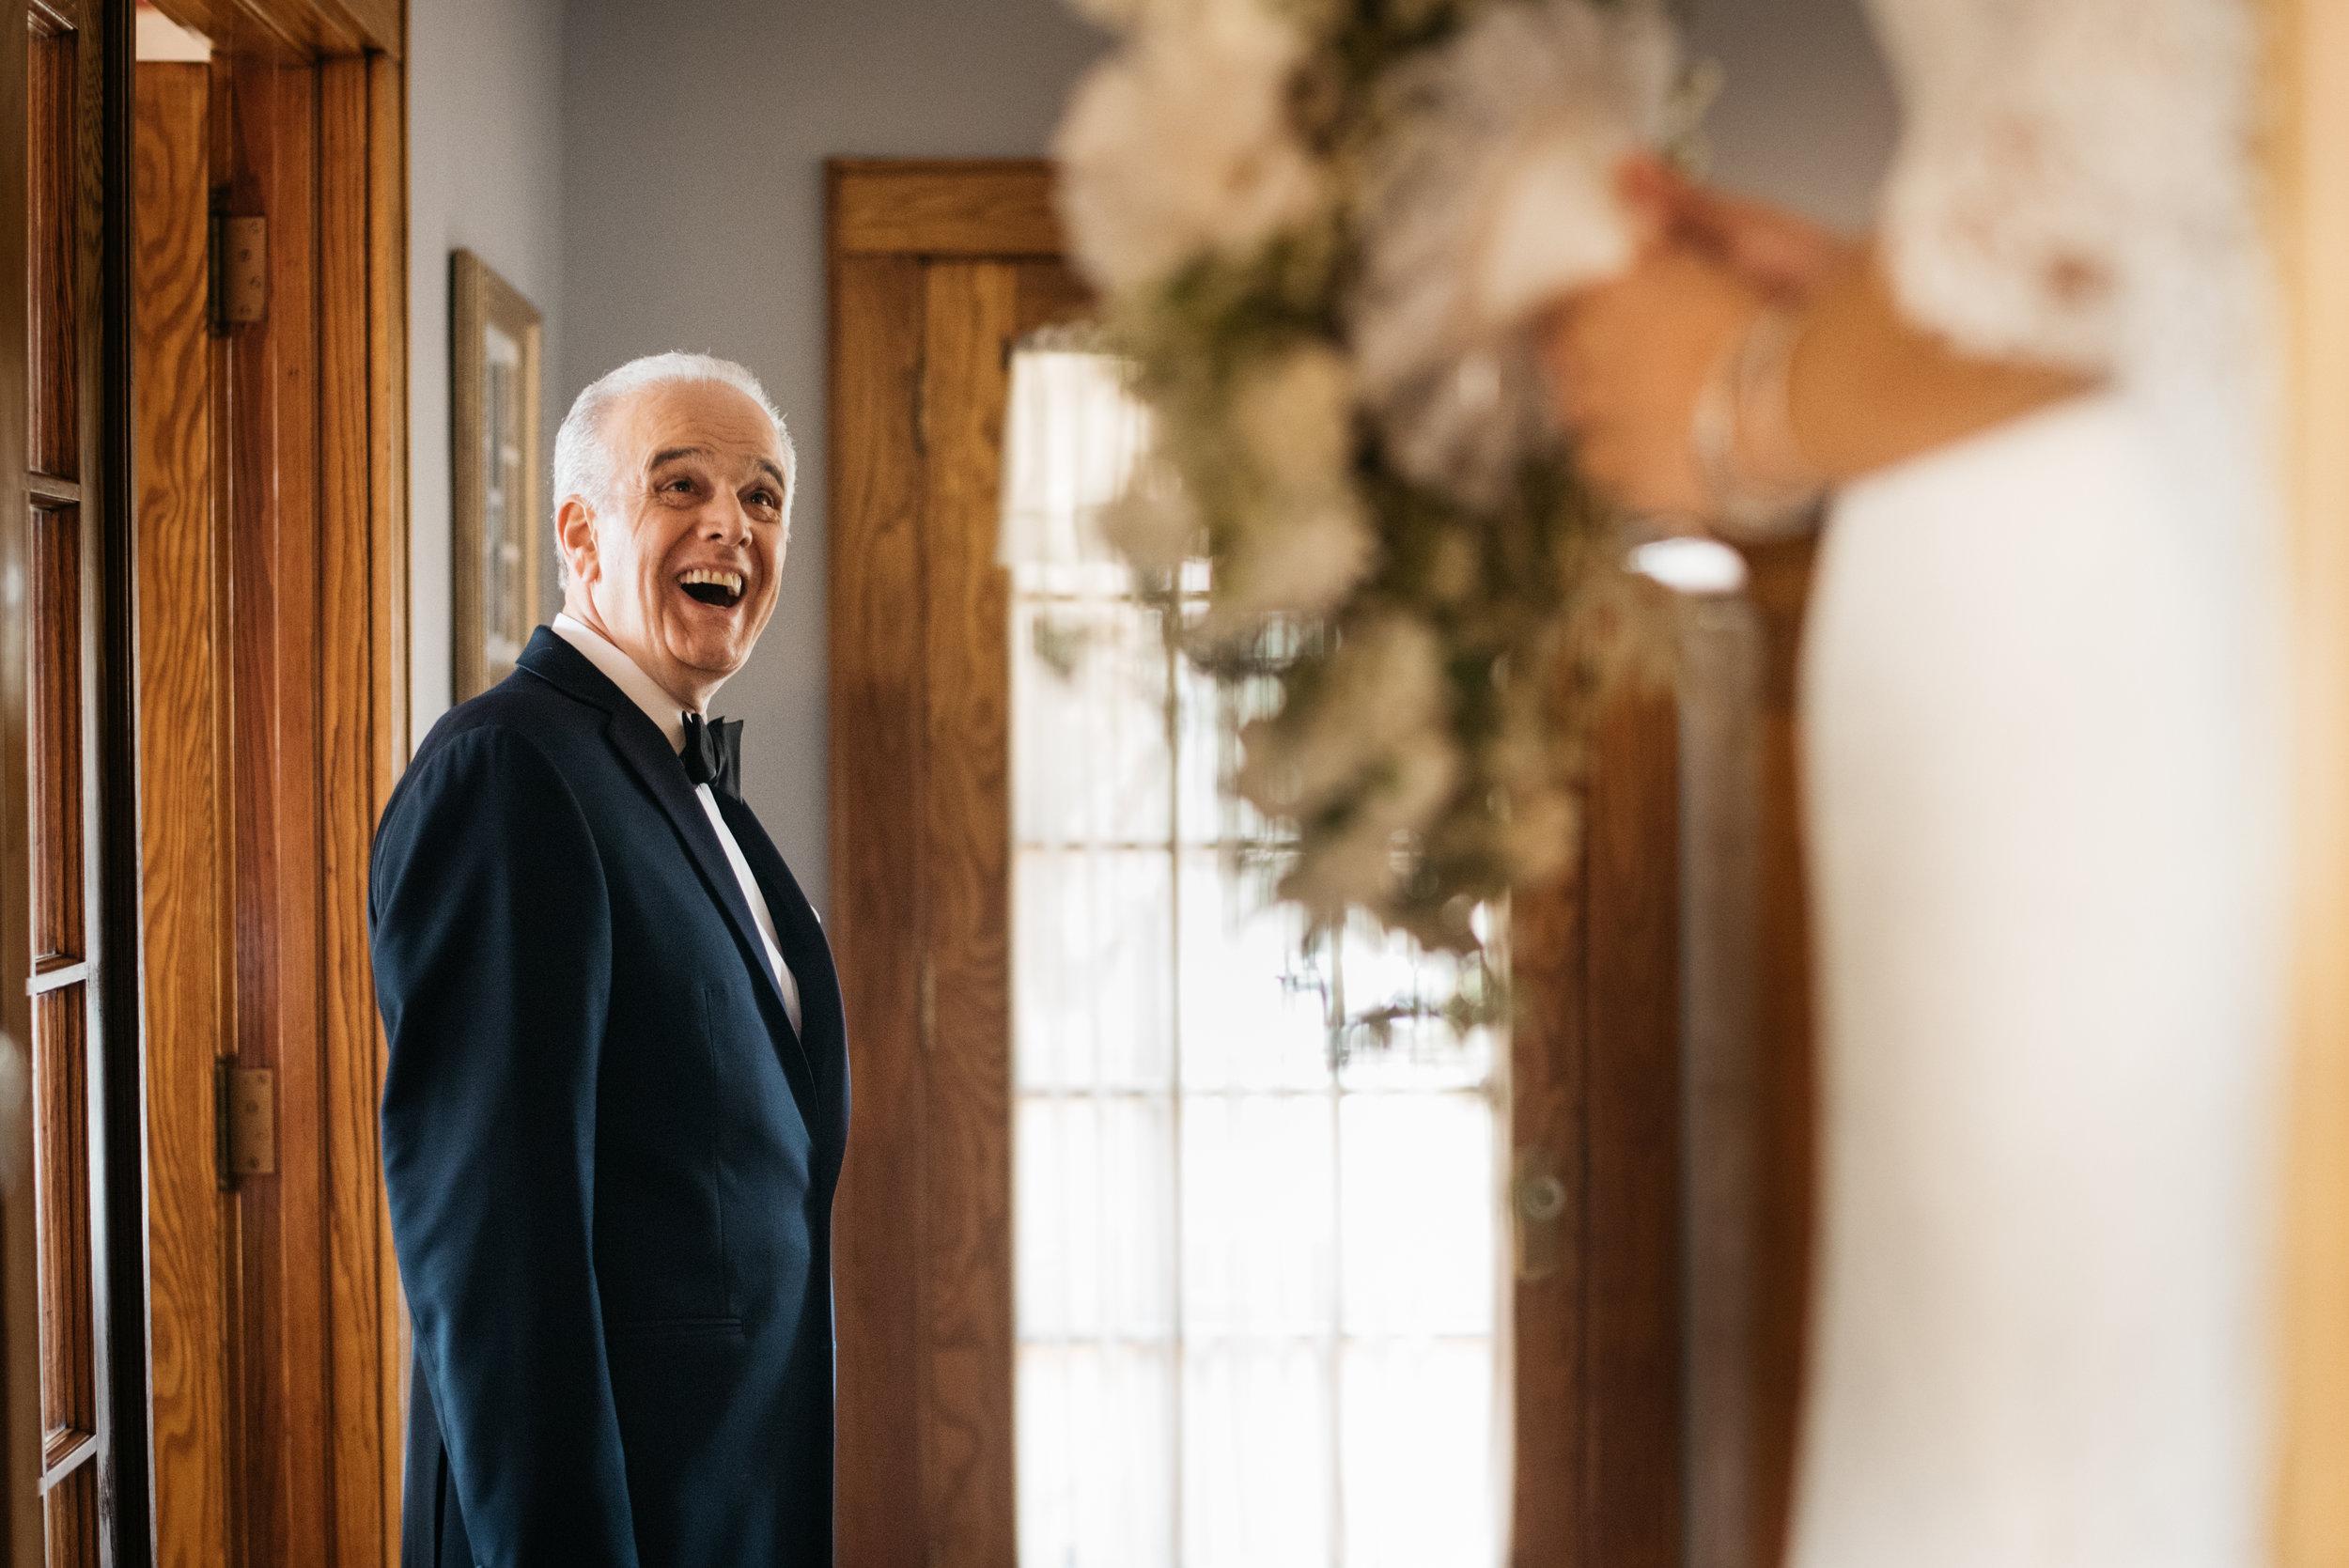 WeddingPhotos | NJPhotographer | Highlights-1-48.jpg